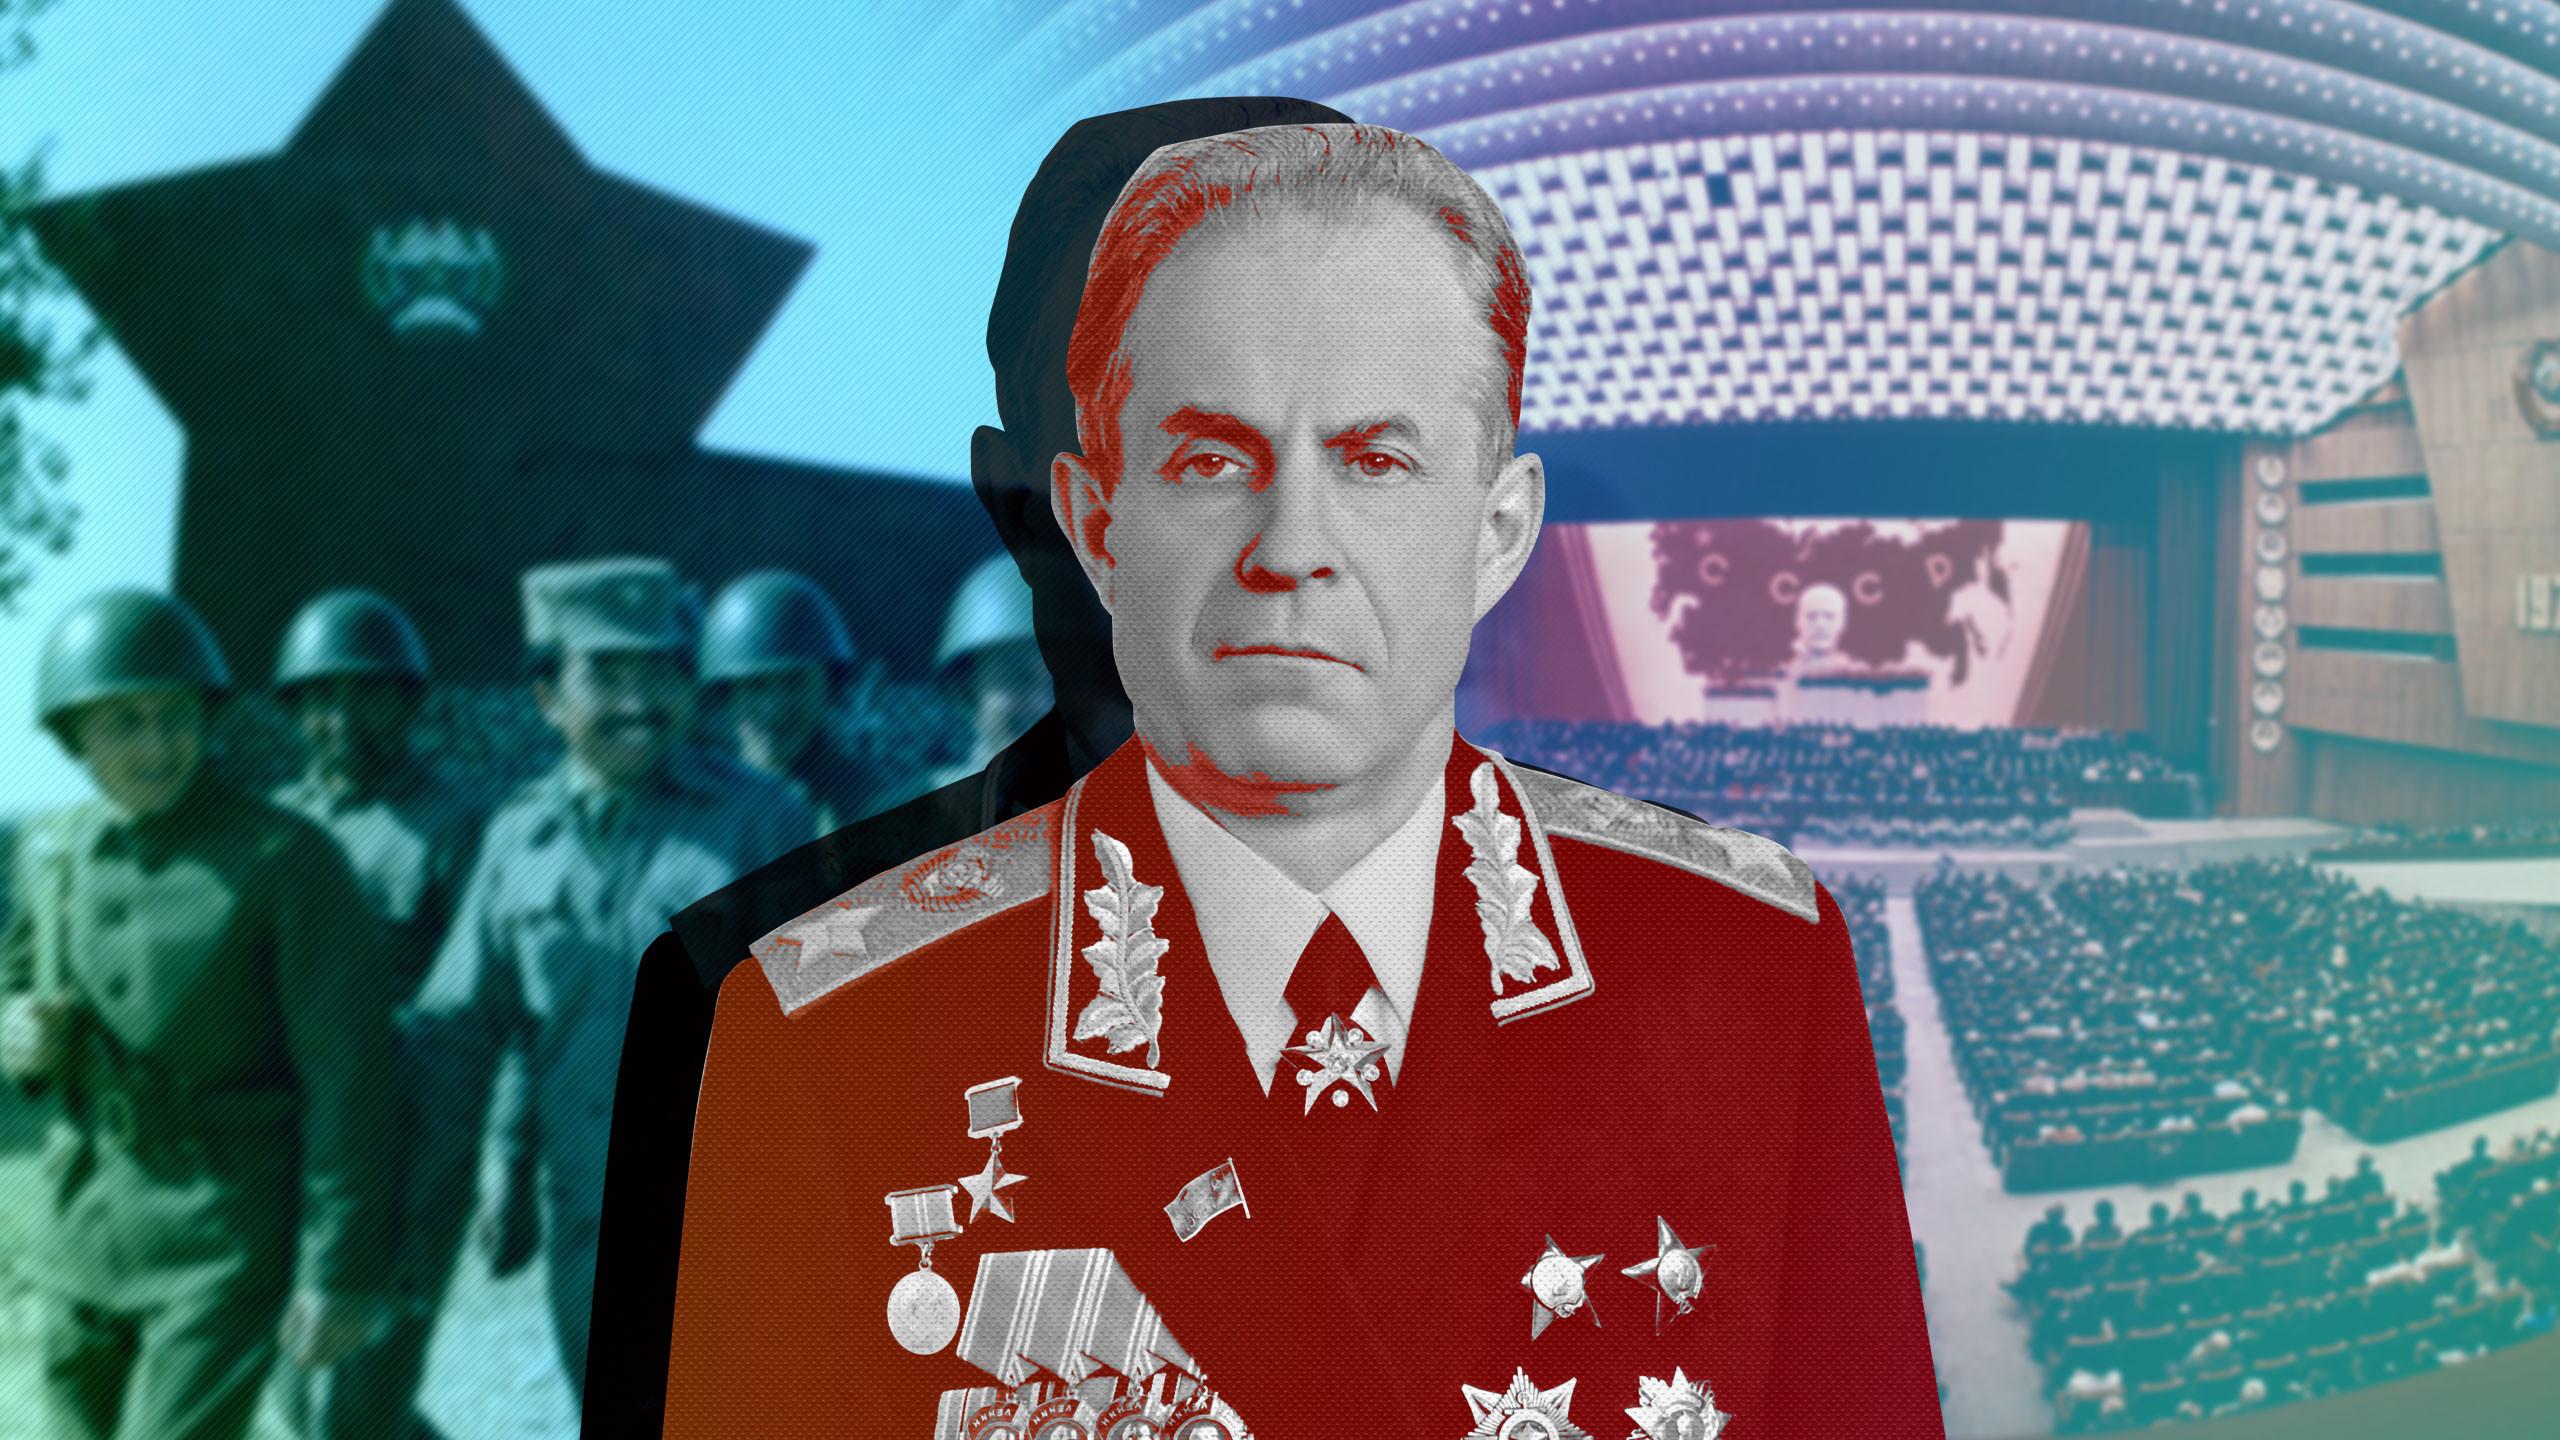 "<p>Фото: &copy; РИА Новости,&nbsp;<a href=""https://sovtime.ru/kpss/"" target=""_blank"">sovtime.ru/Д.Бальтерманц</a></p>"